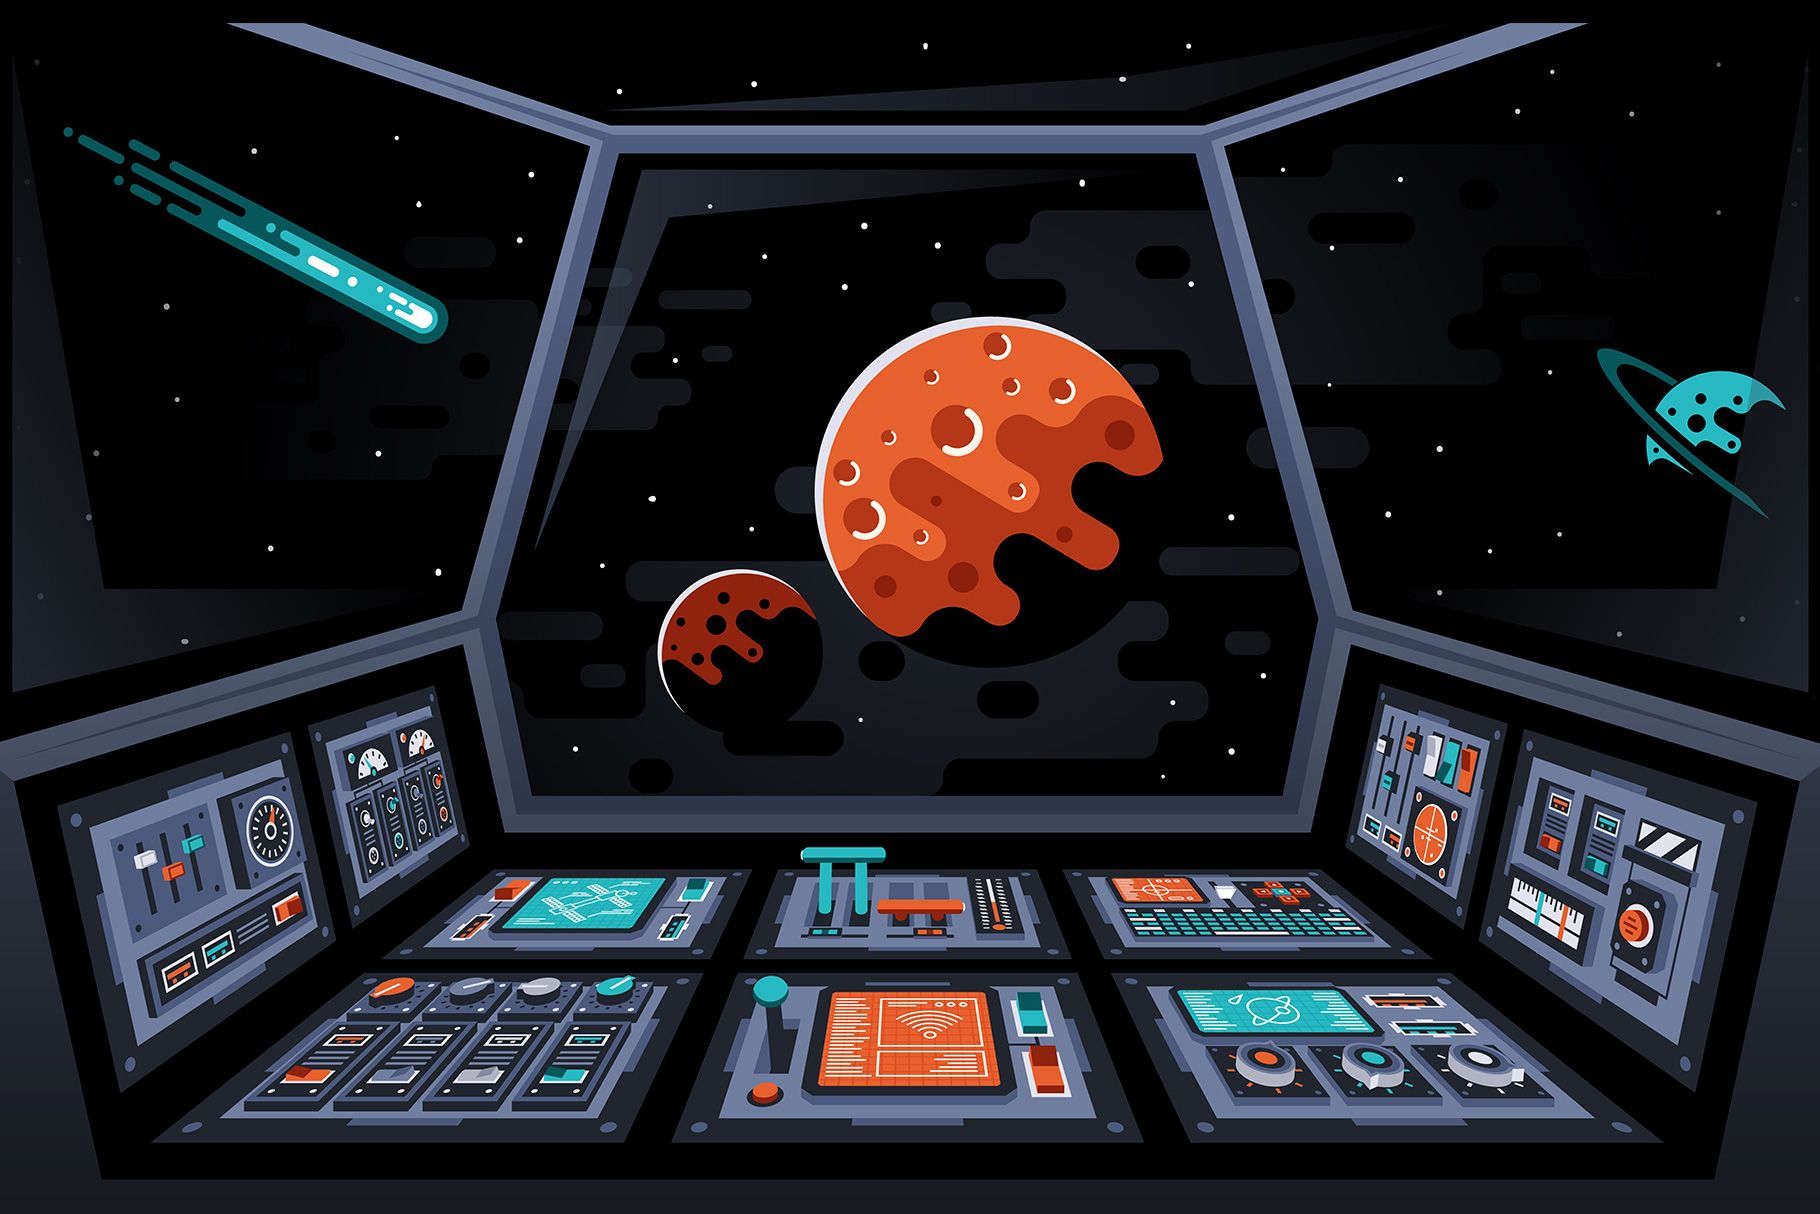 Control Panels Spaceship example image 8